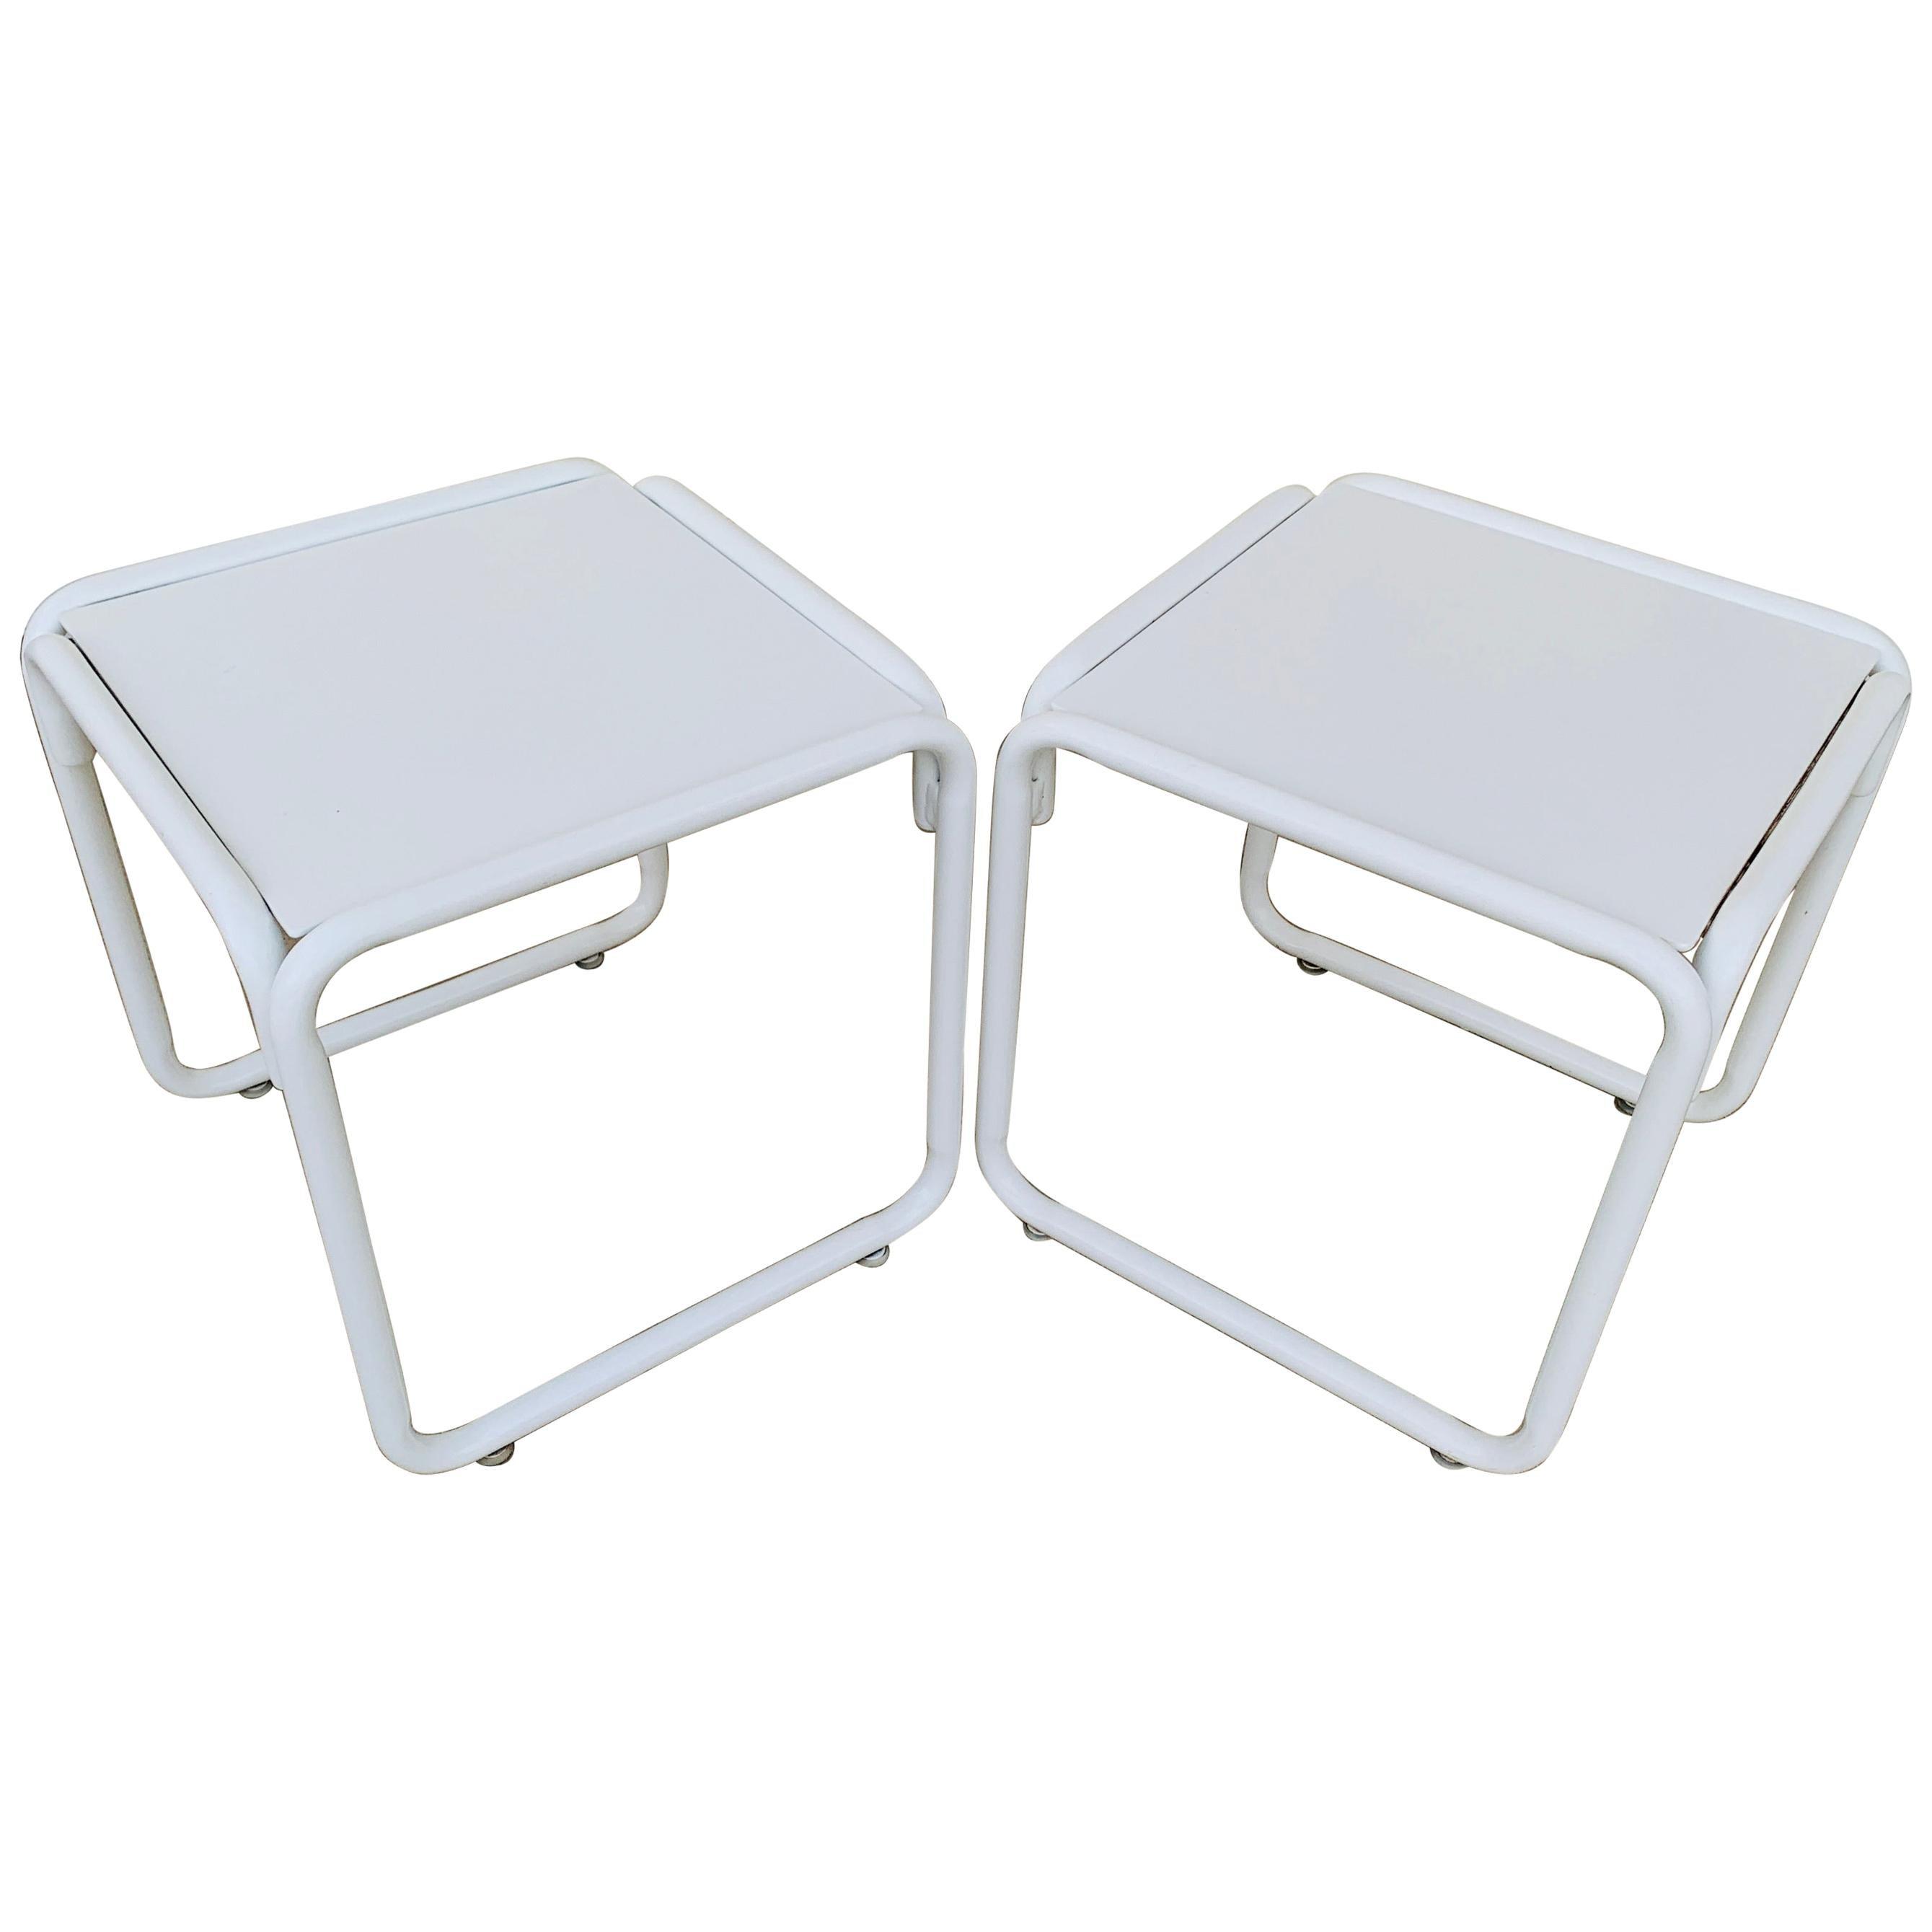 Pair of Brown Jordan Patio Table in White Metal